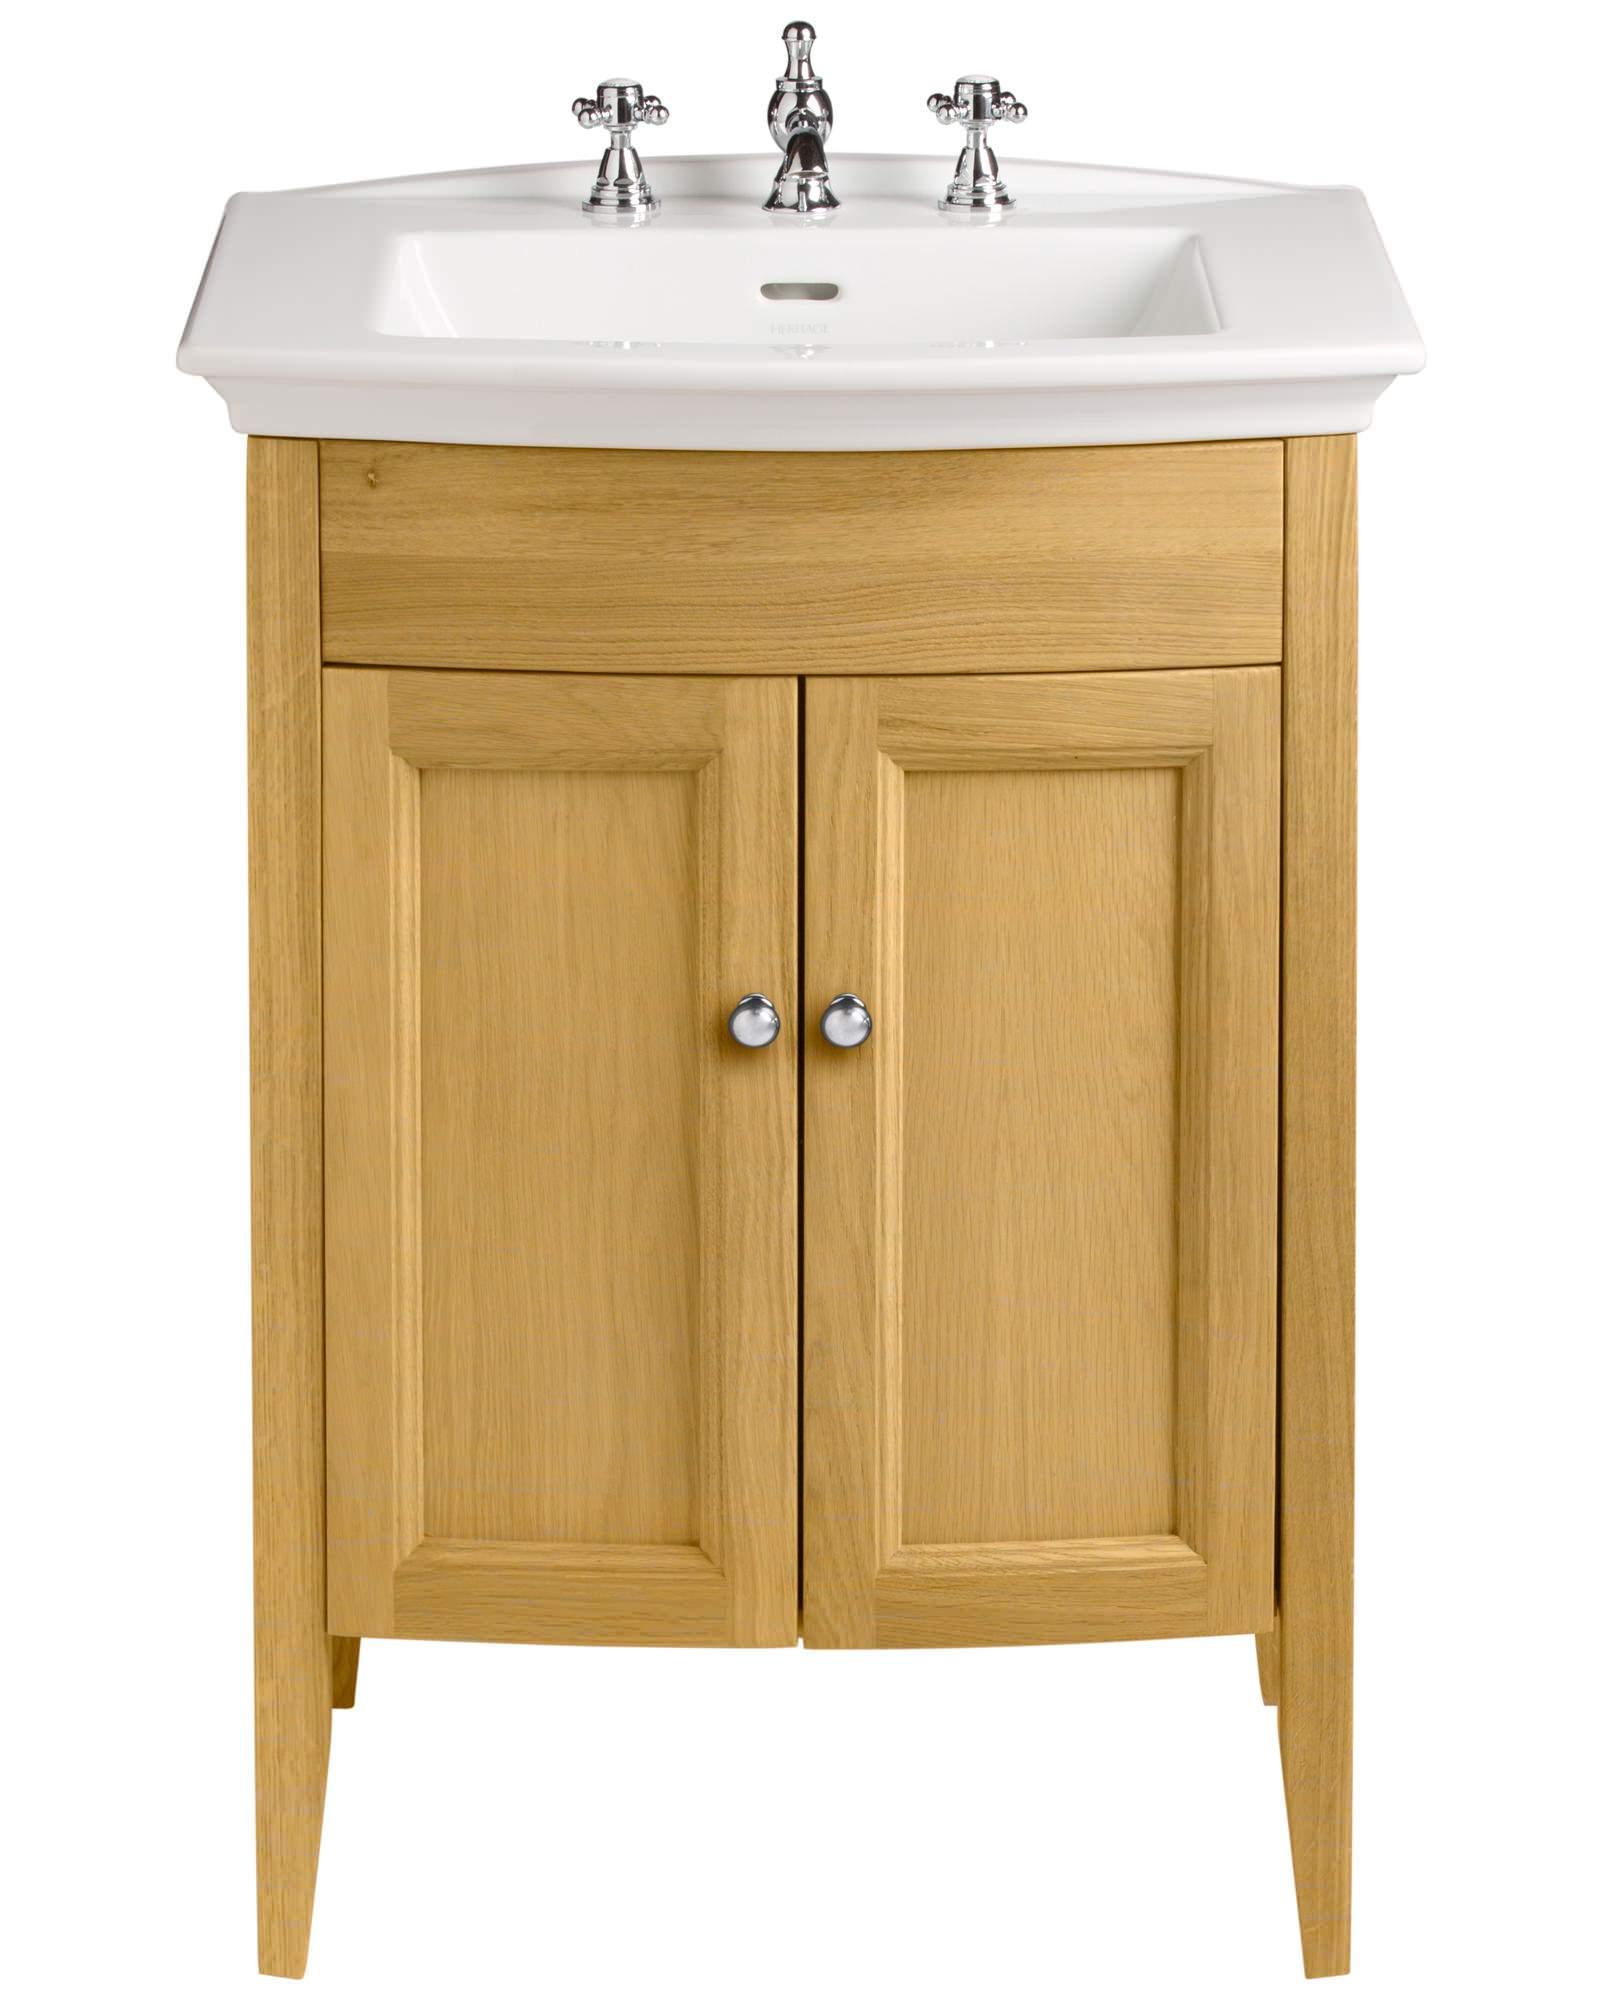 Heritage Bathroom Vanity: Heritage Caversham Oak Vanity Unit For Blenheim Basin